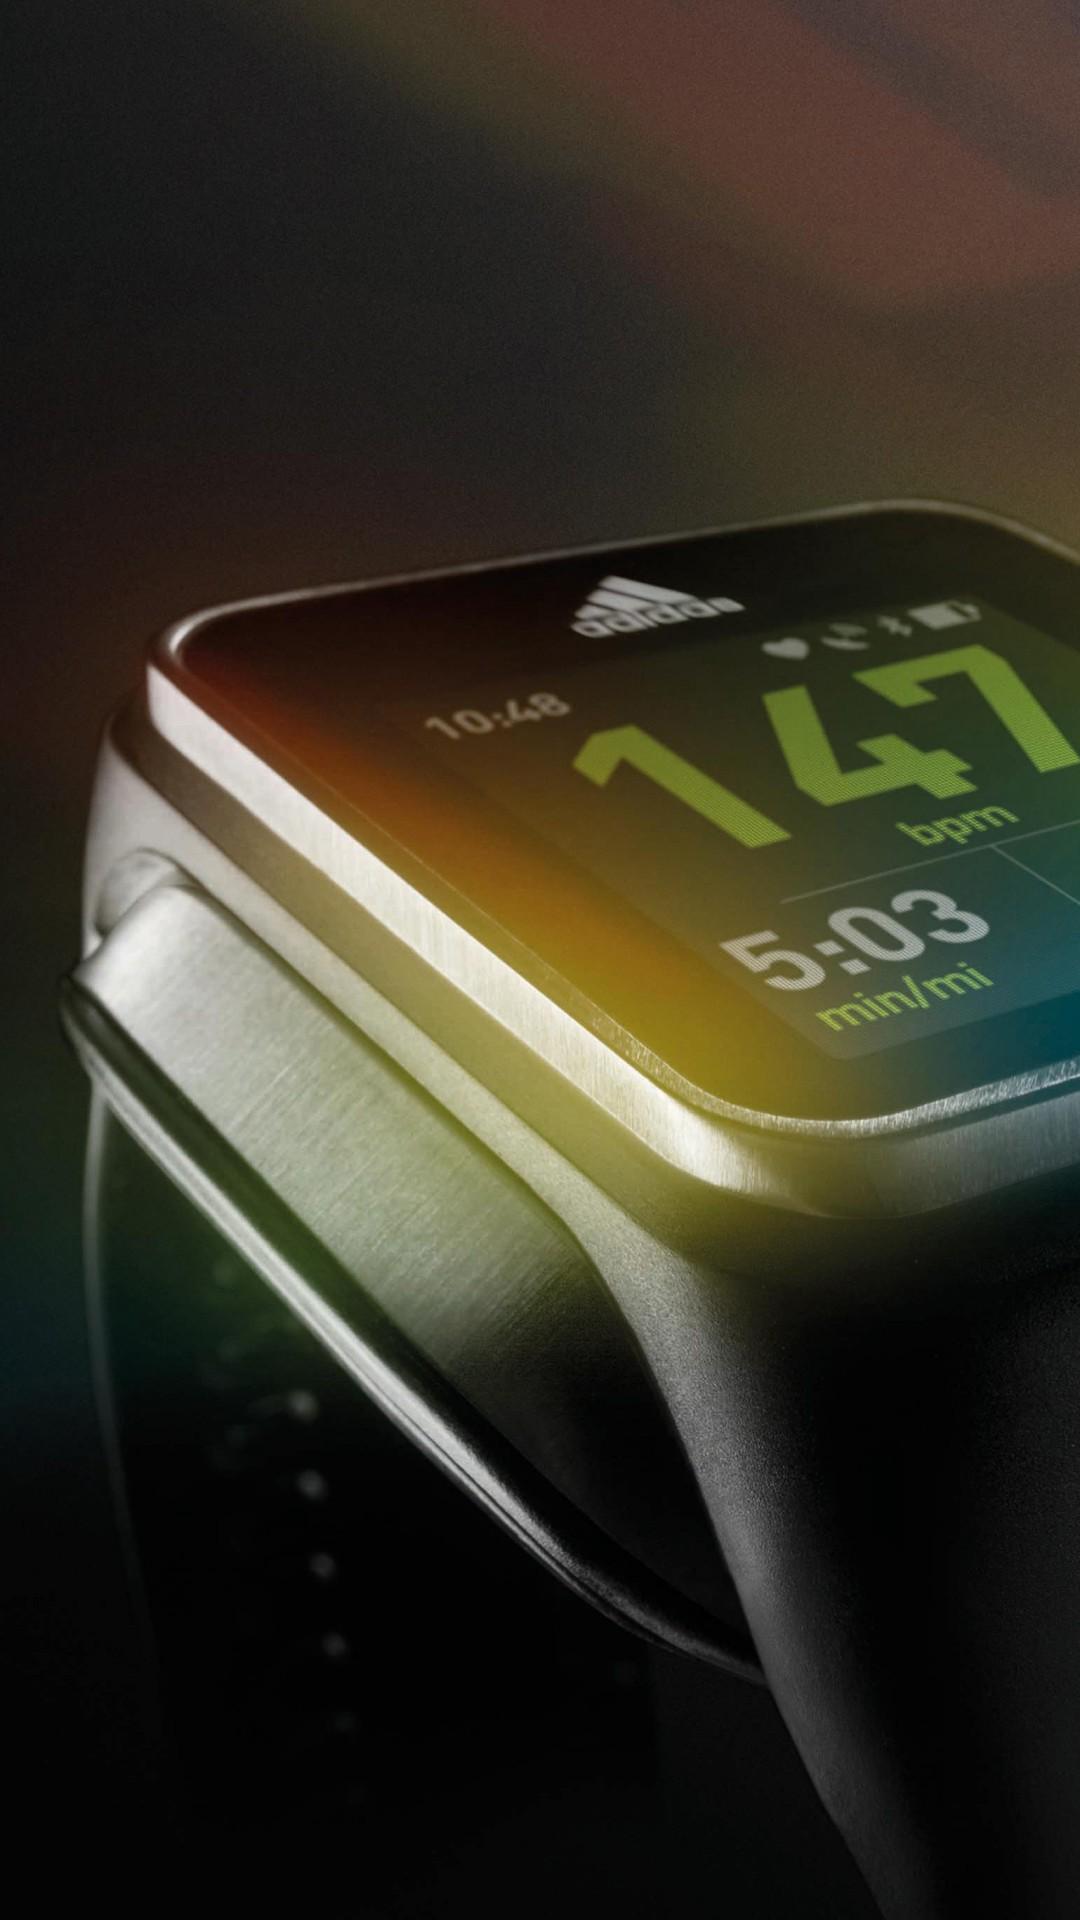 Adidas Micoach Smartwatches